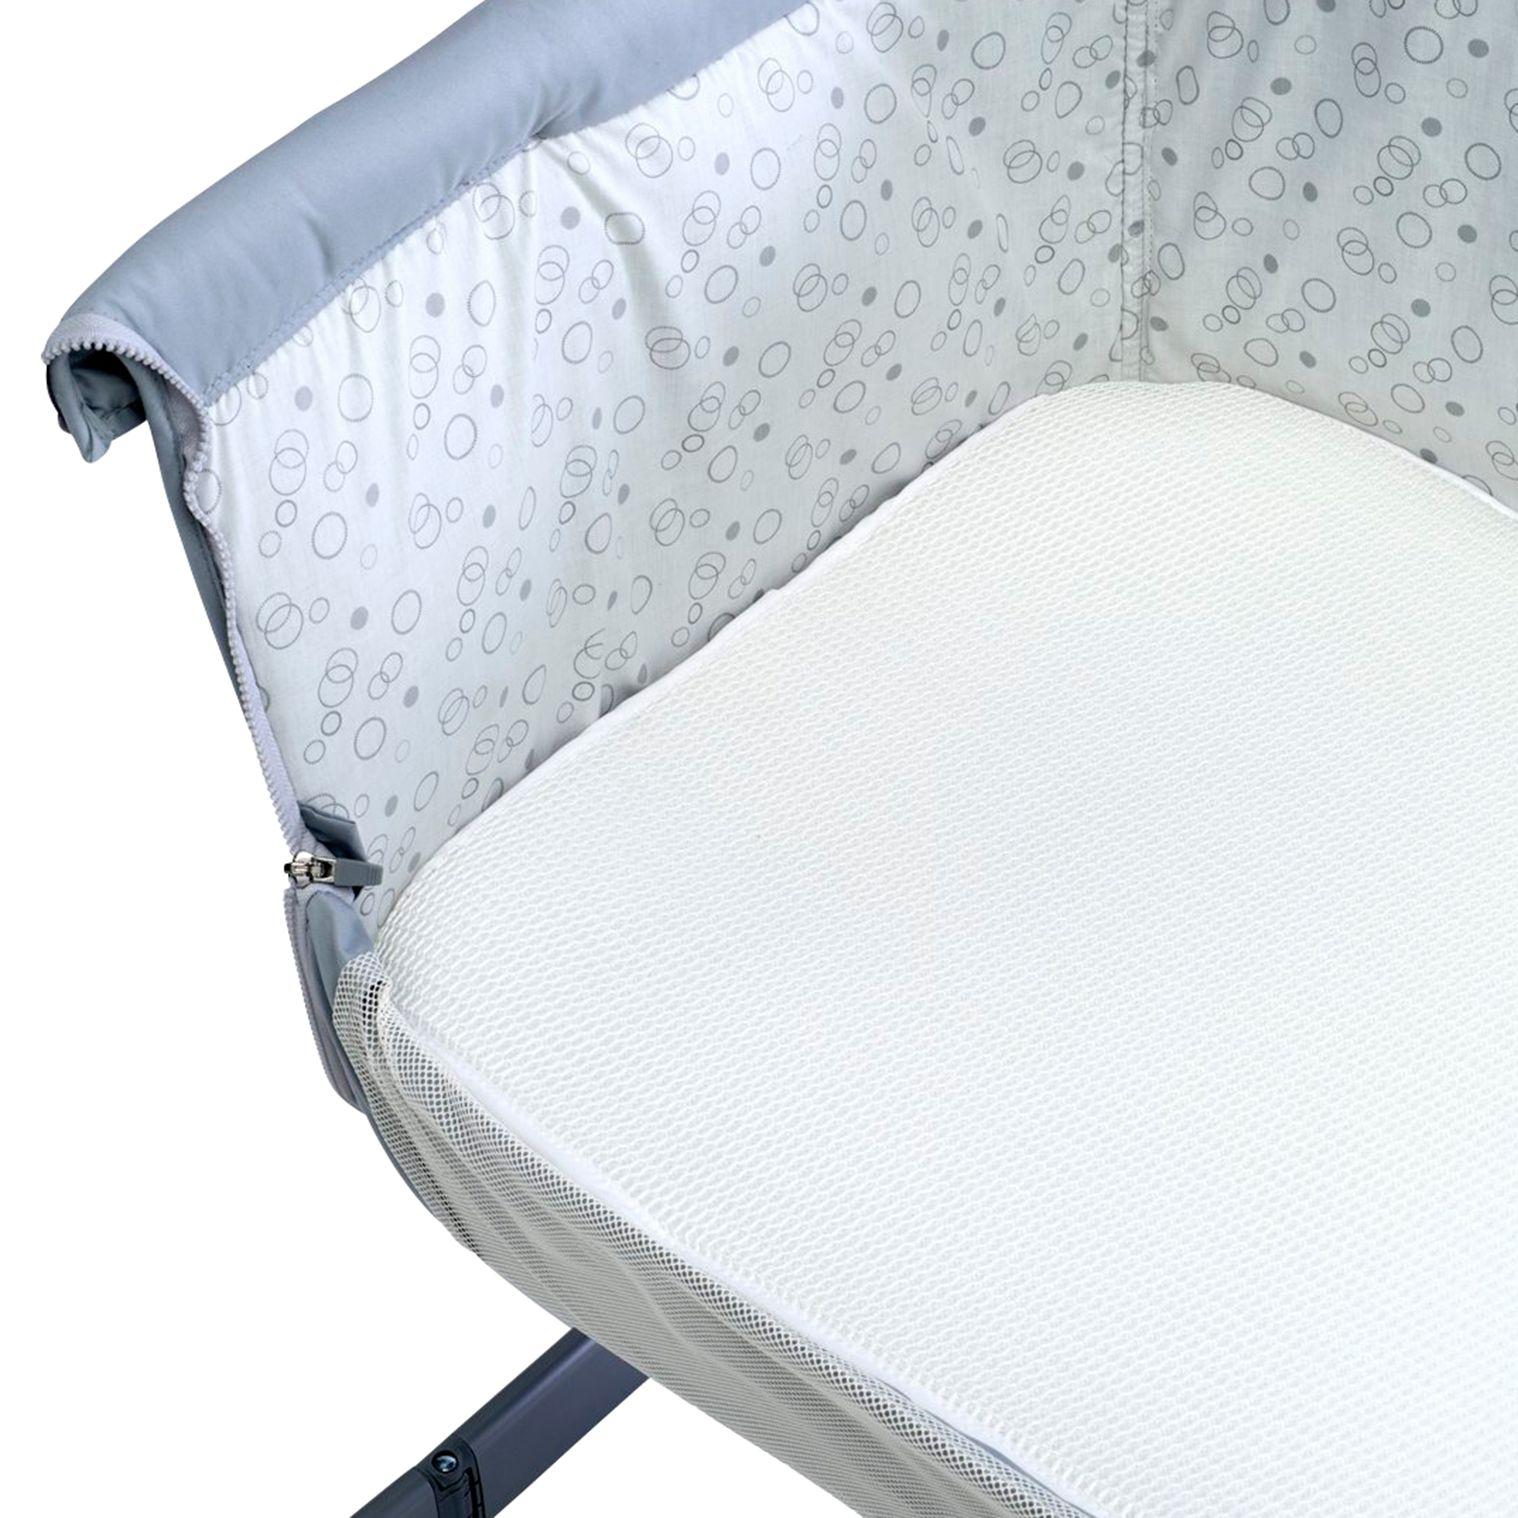 Chicco Chicco Night Breeze Bedside Crib Mattress Topper, White